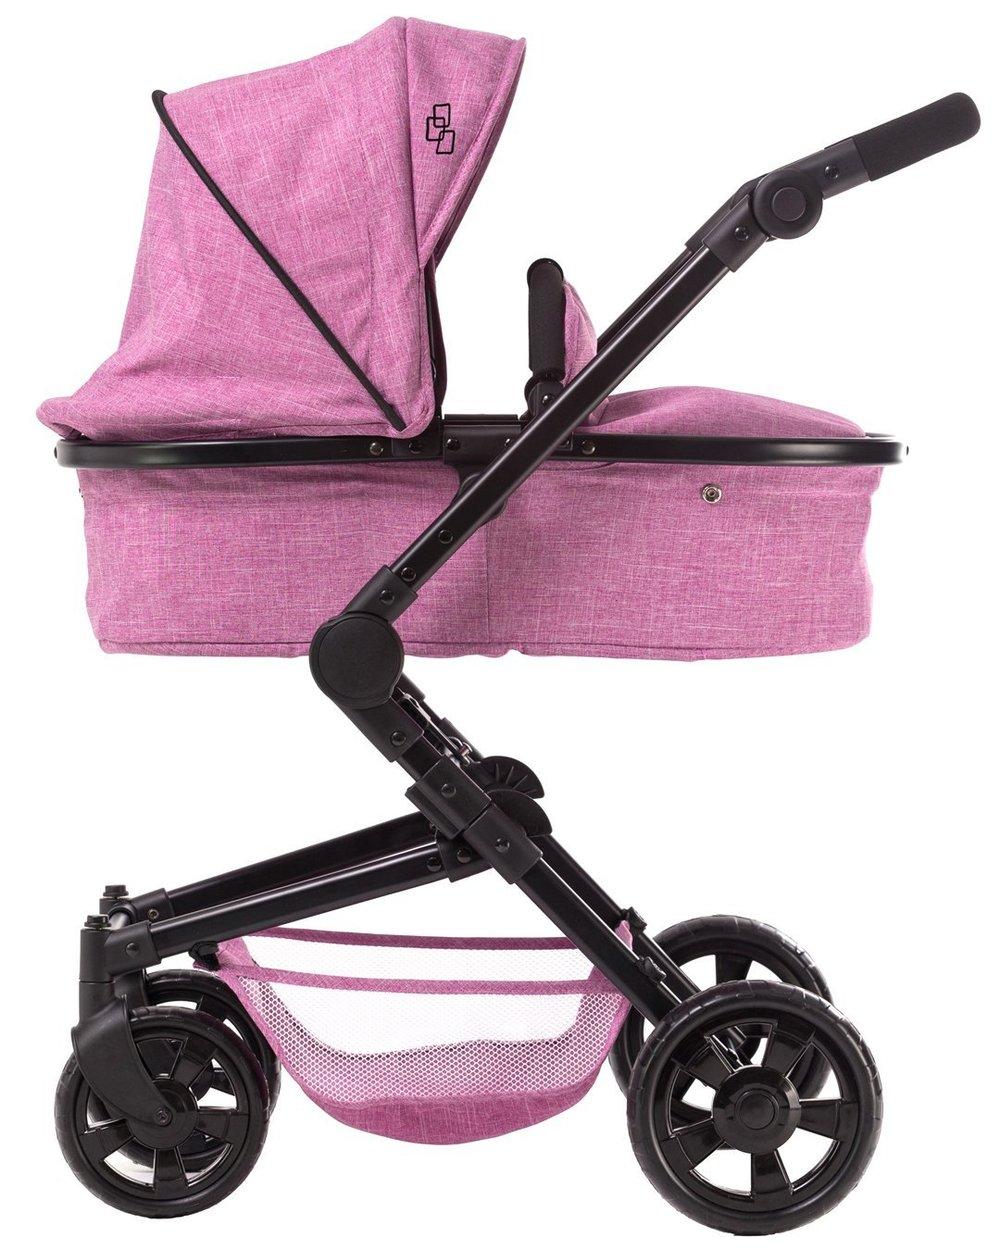 Triokid 2-in-1 Deluxe Doll Stroller